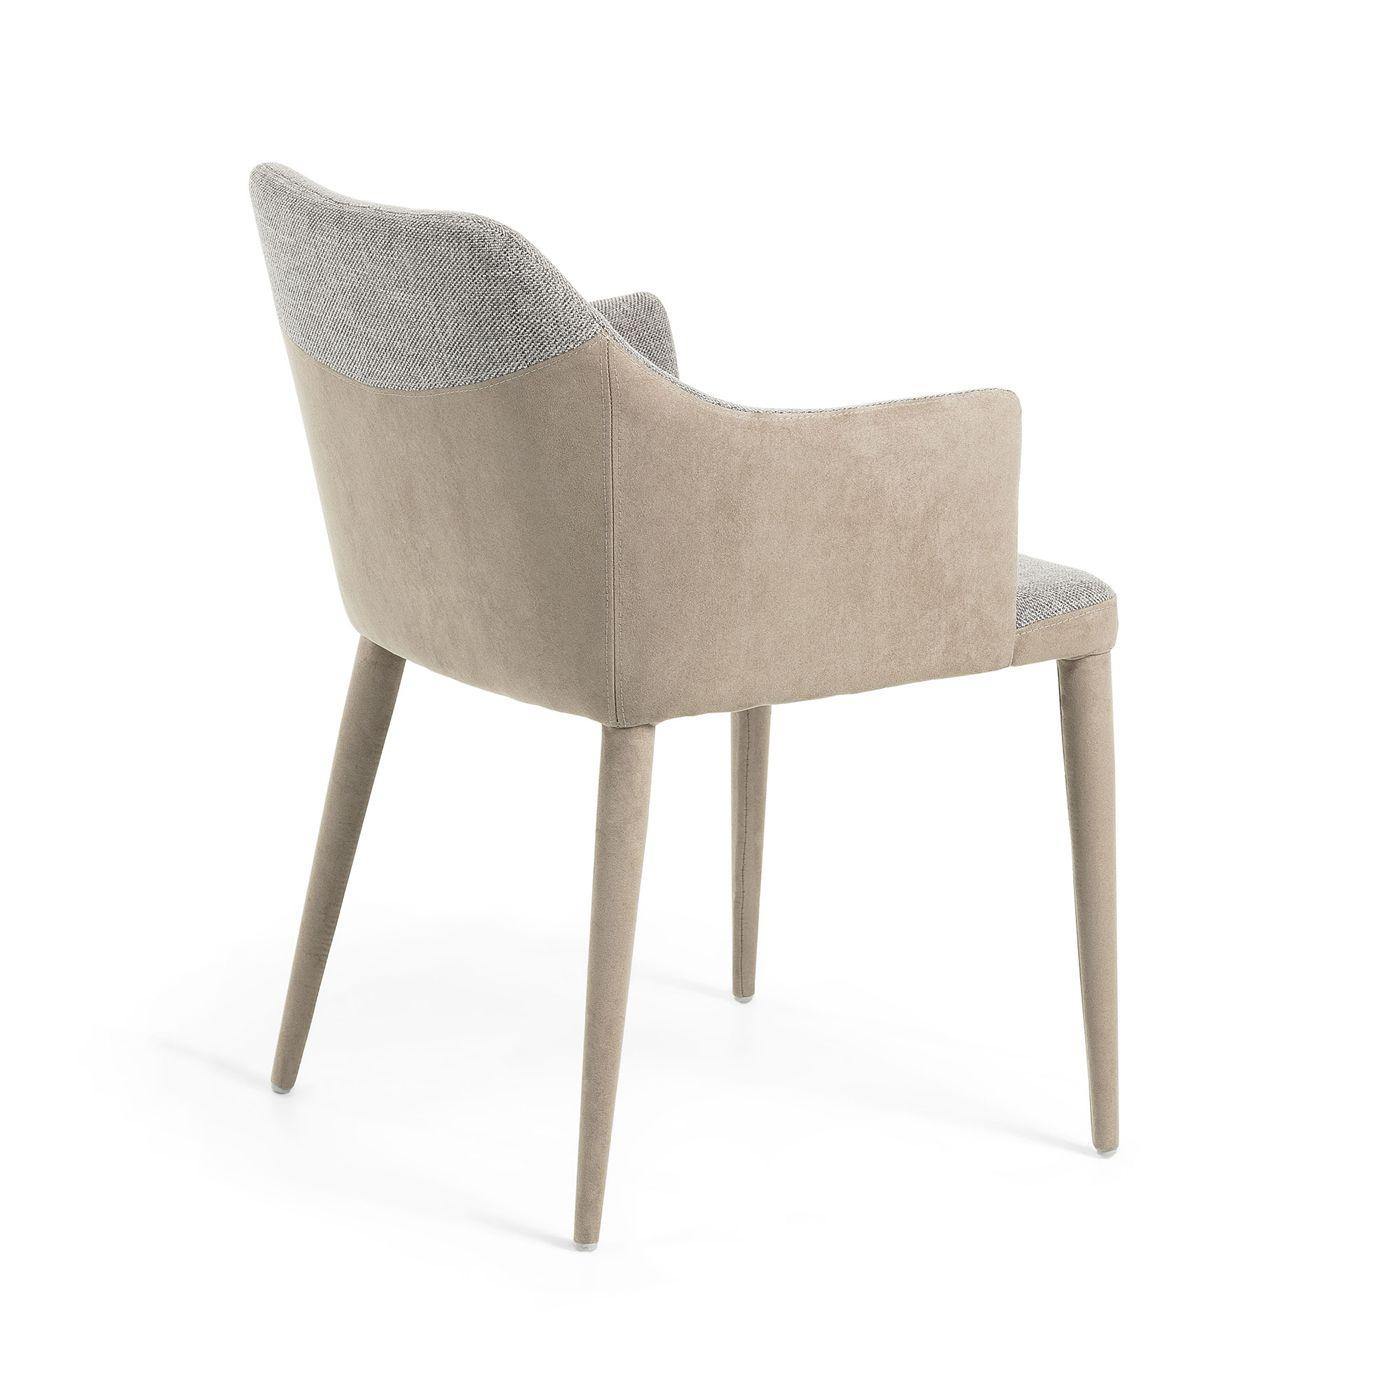 LaForma Danai Spisebordsstol - Lysegrå